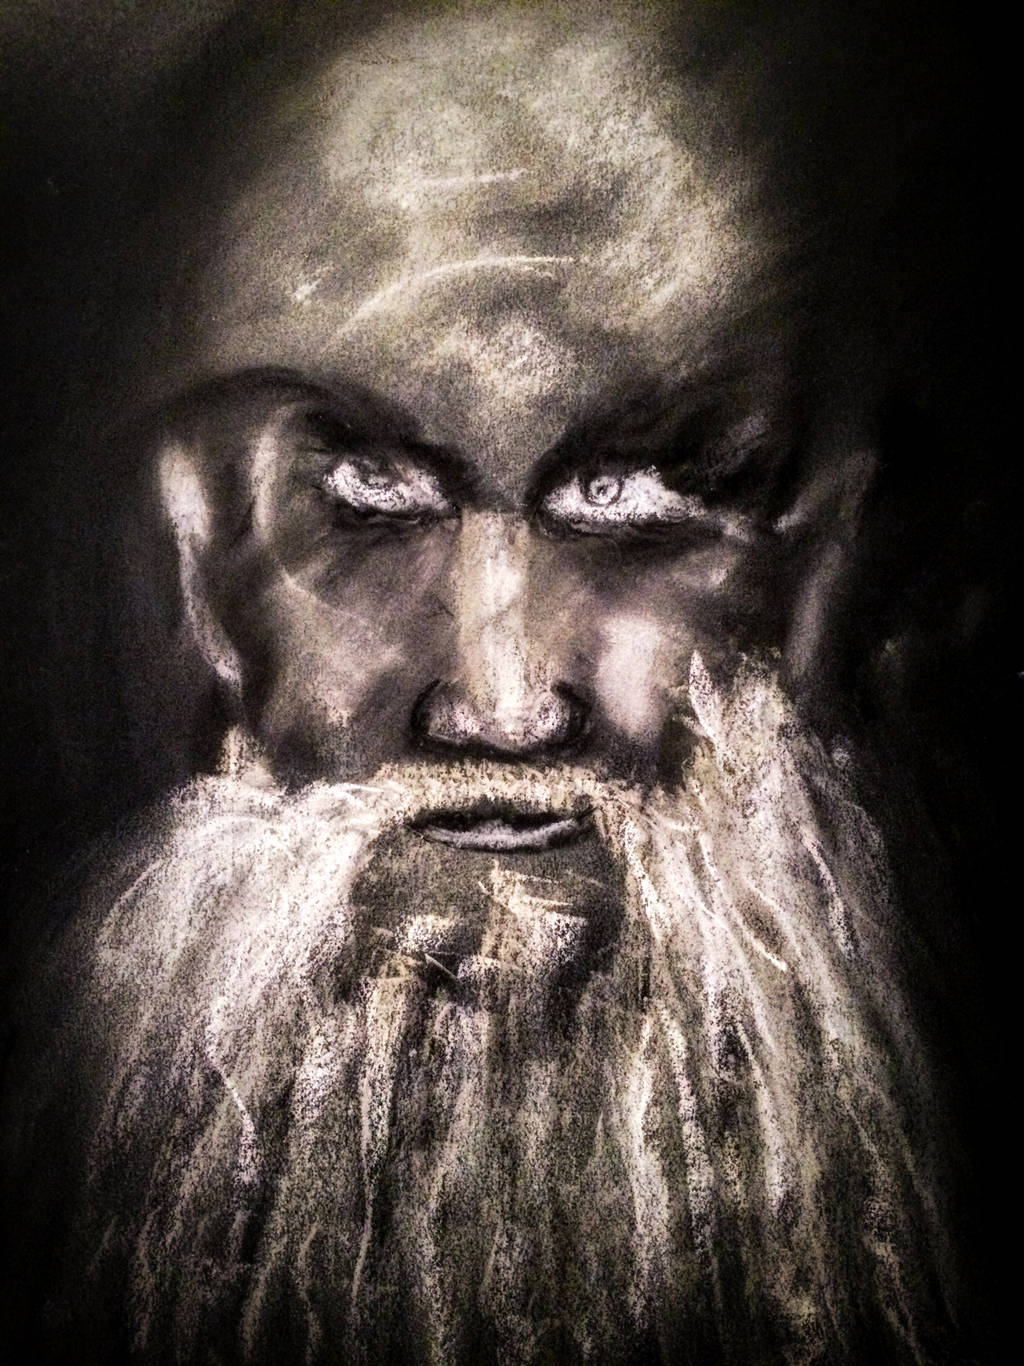 GNOME by WeirdDarkness